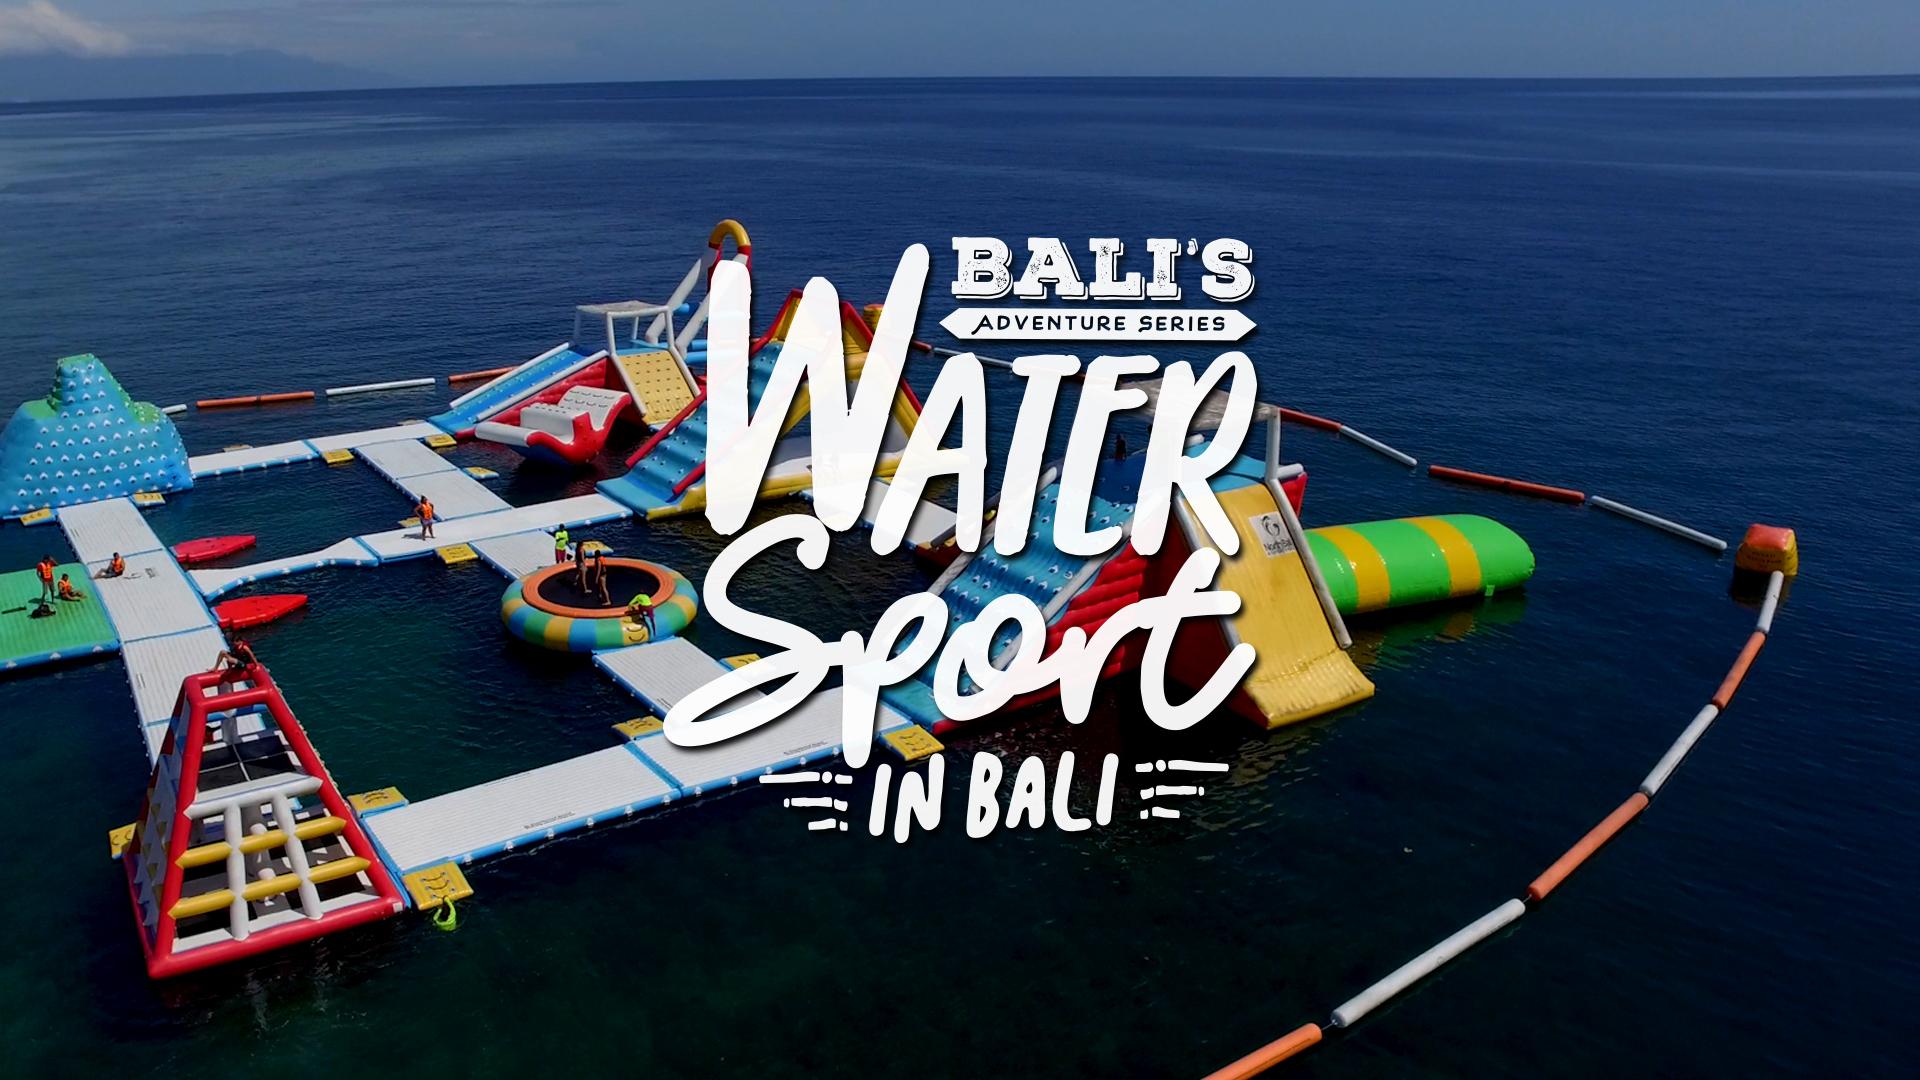 Bali's Adventure Series: Water Sport in Bali